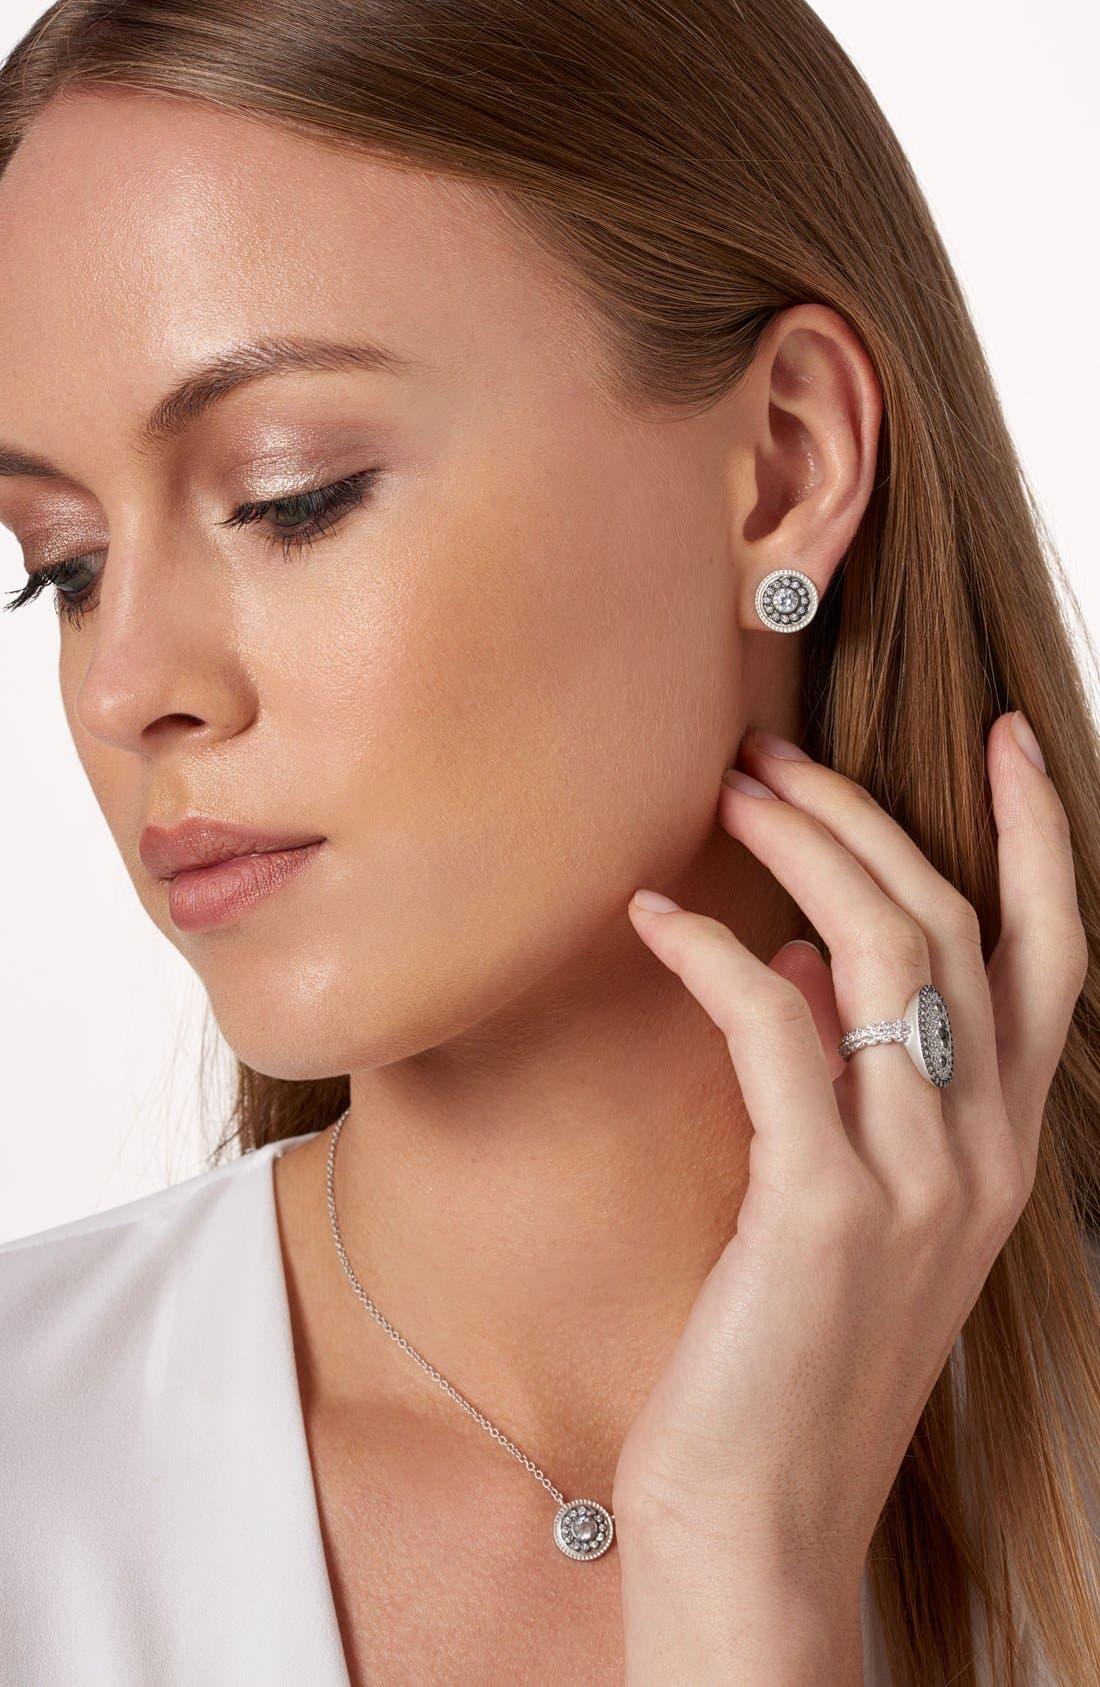 'Nautical Button' Stud Earrings,                             Alternate thumbnail 2, color,                             Silver/ Gunmetal/ Clear